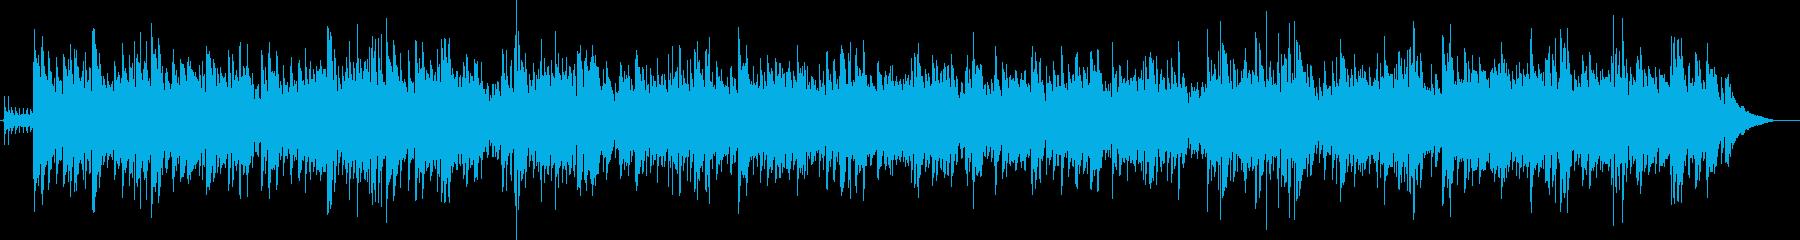 Xmasアコギと鈴かわいいカントリー 冬の再生済みの波形